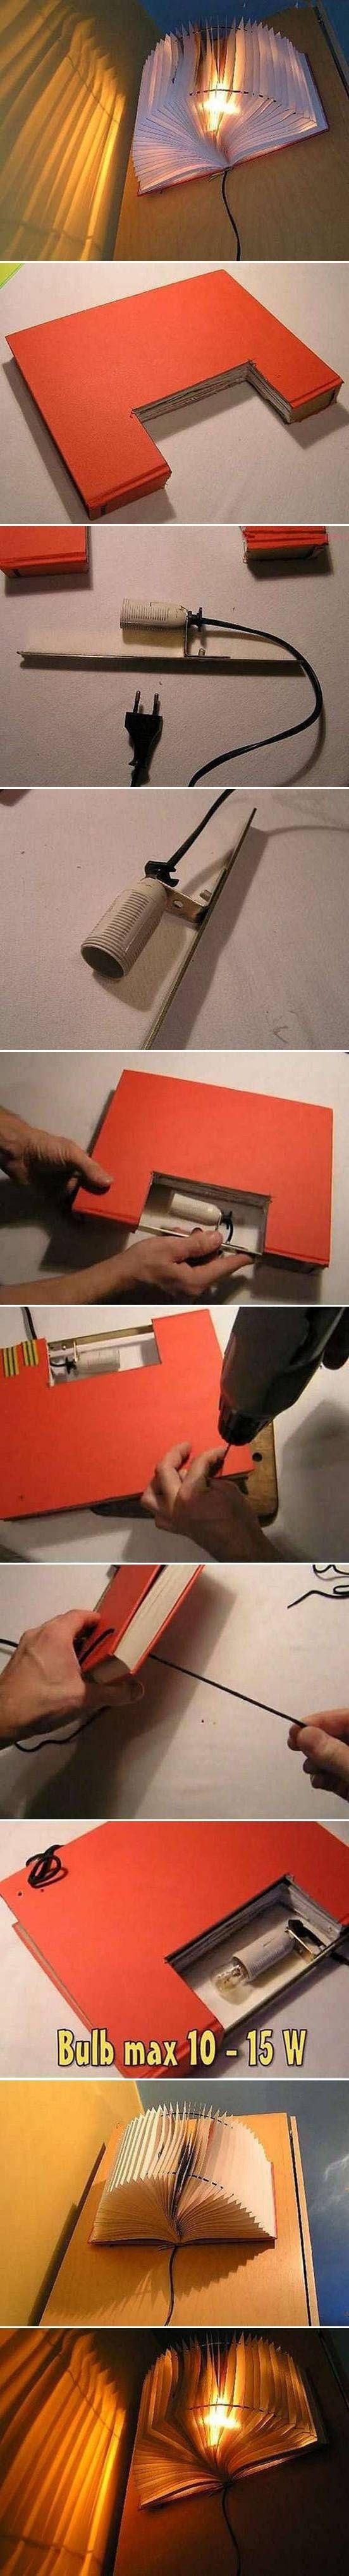 Diy Cool Lamp Diy Crafts Tutorials Library For Love Of  # Muebles Rial Asados